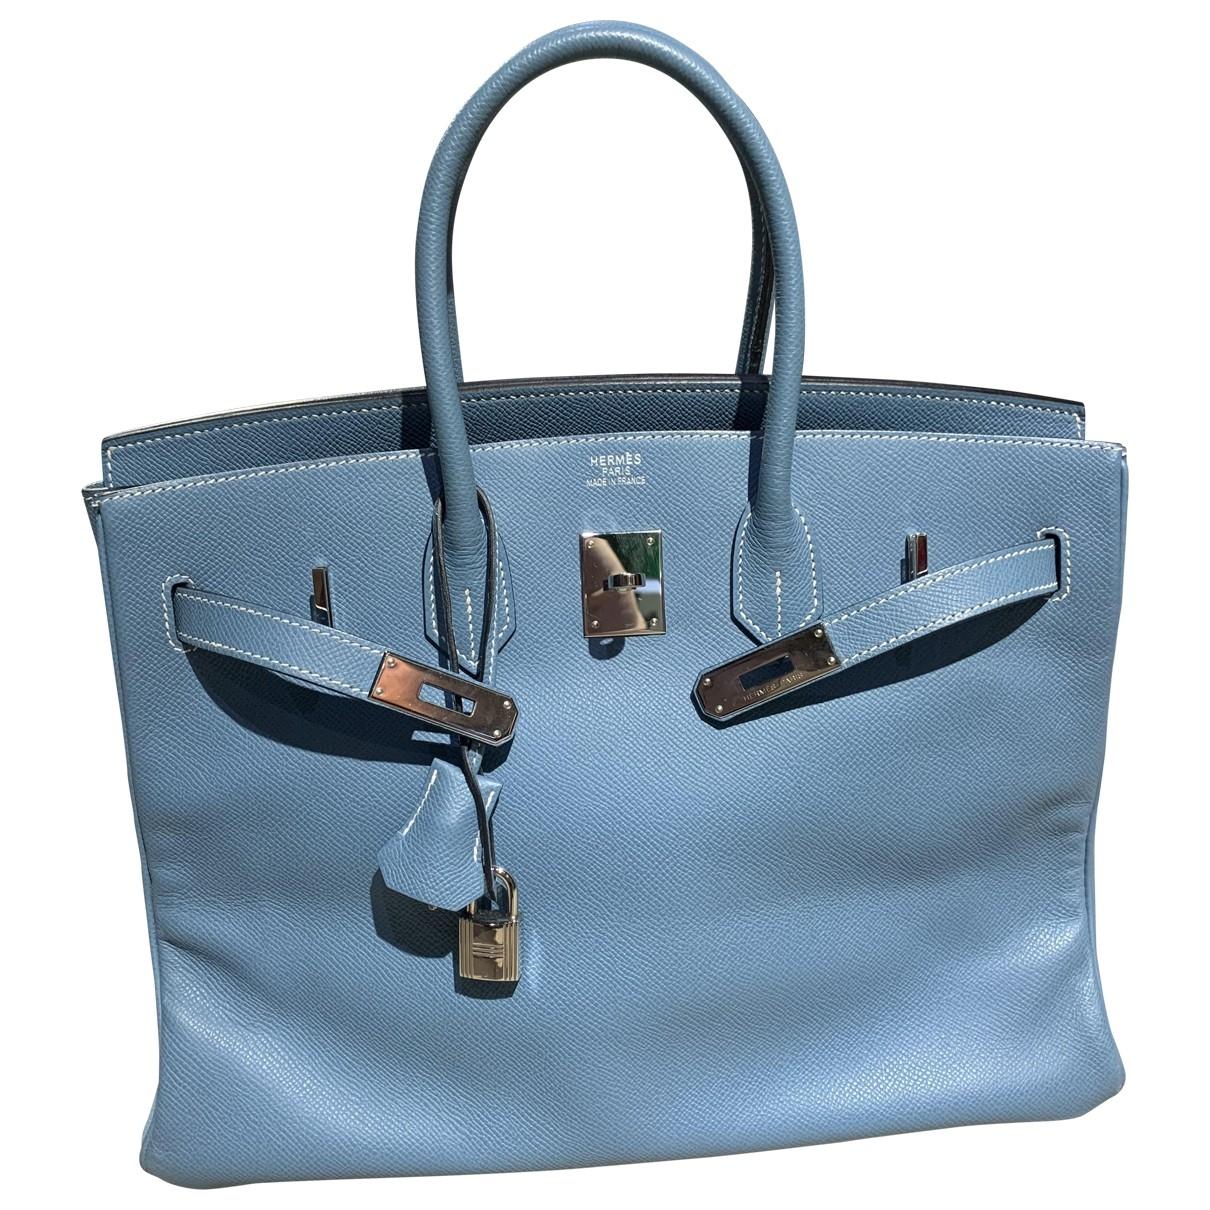 Hermes Birkin 35 Handtasche in  Blau Leder